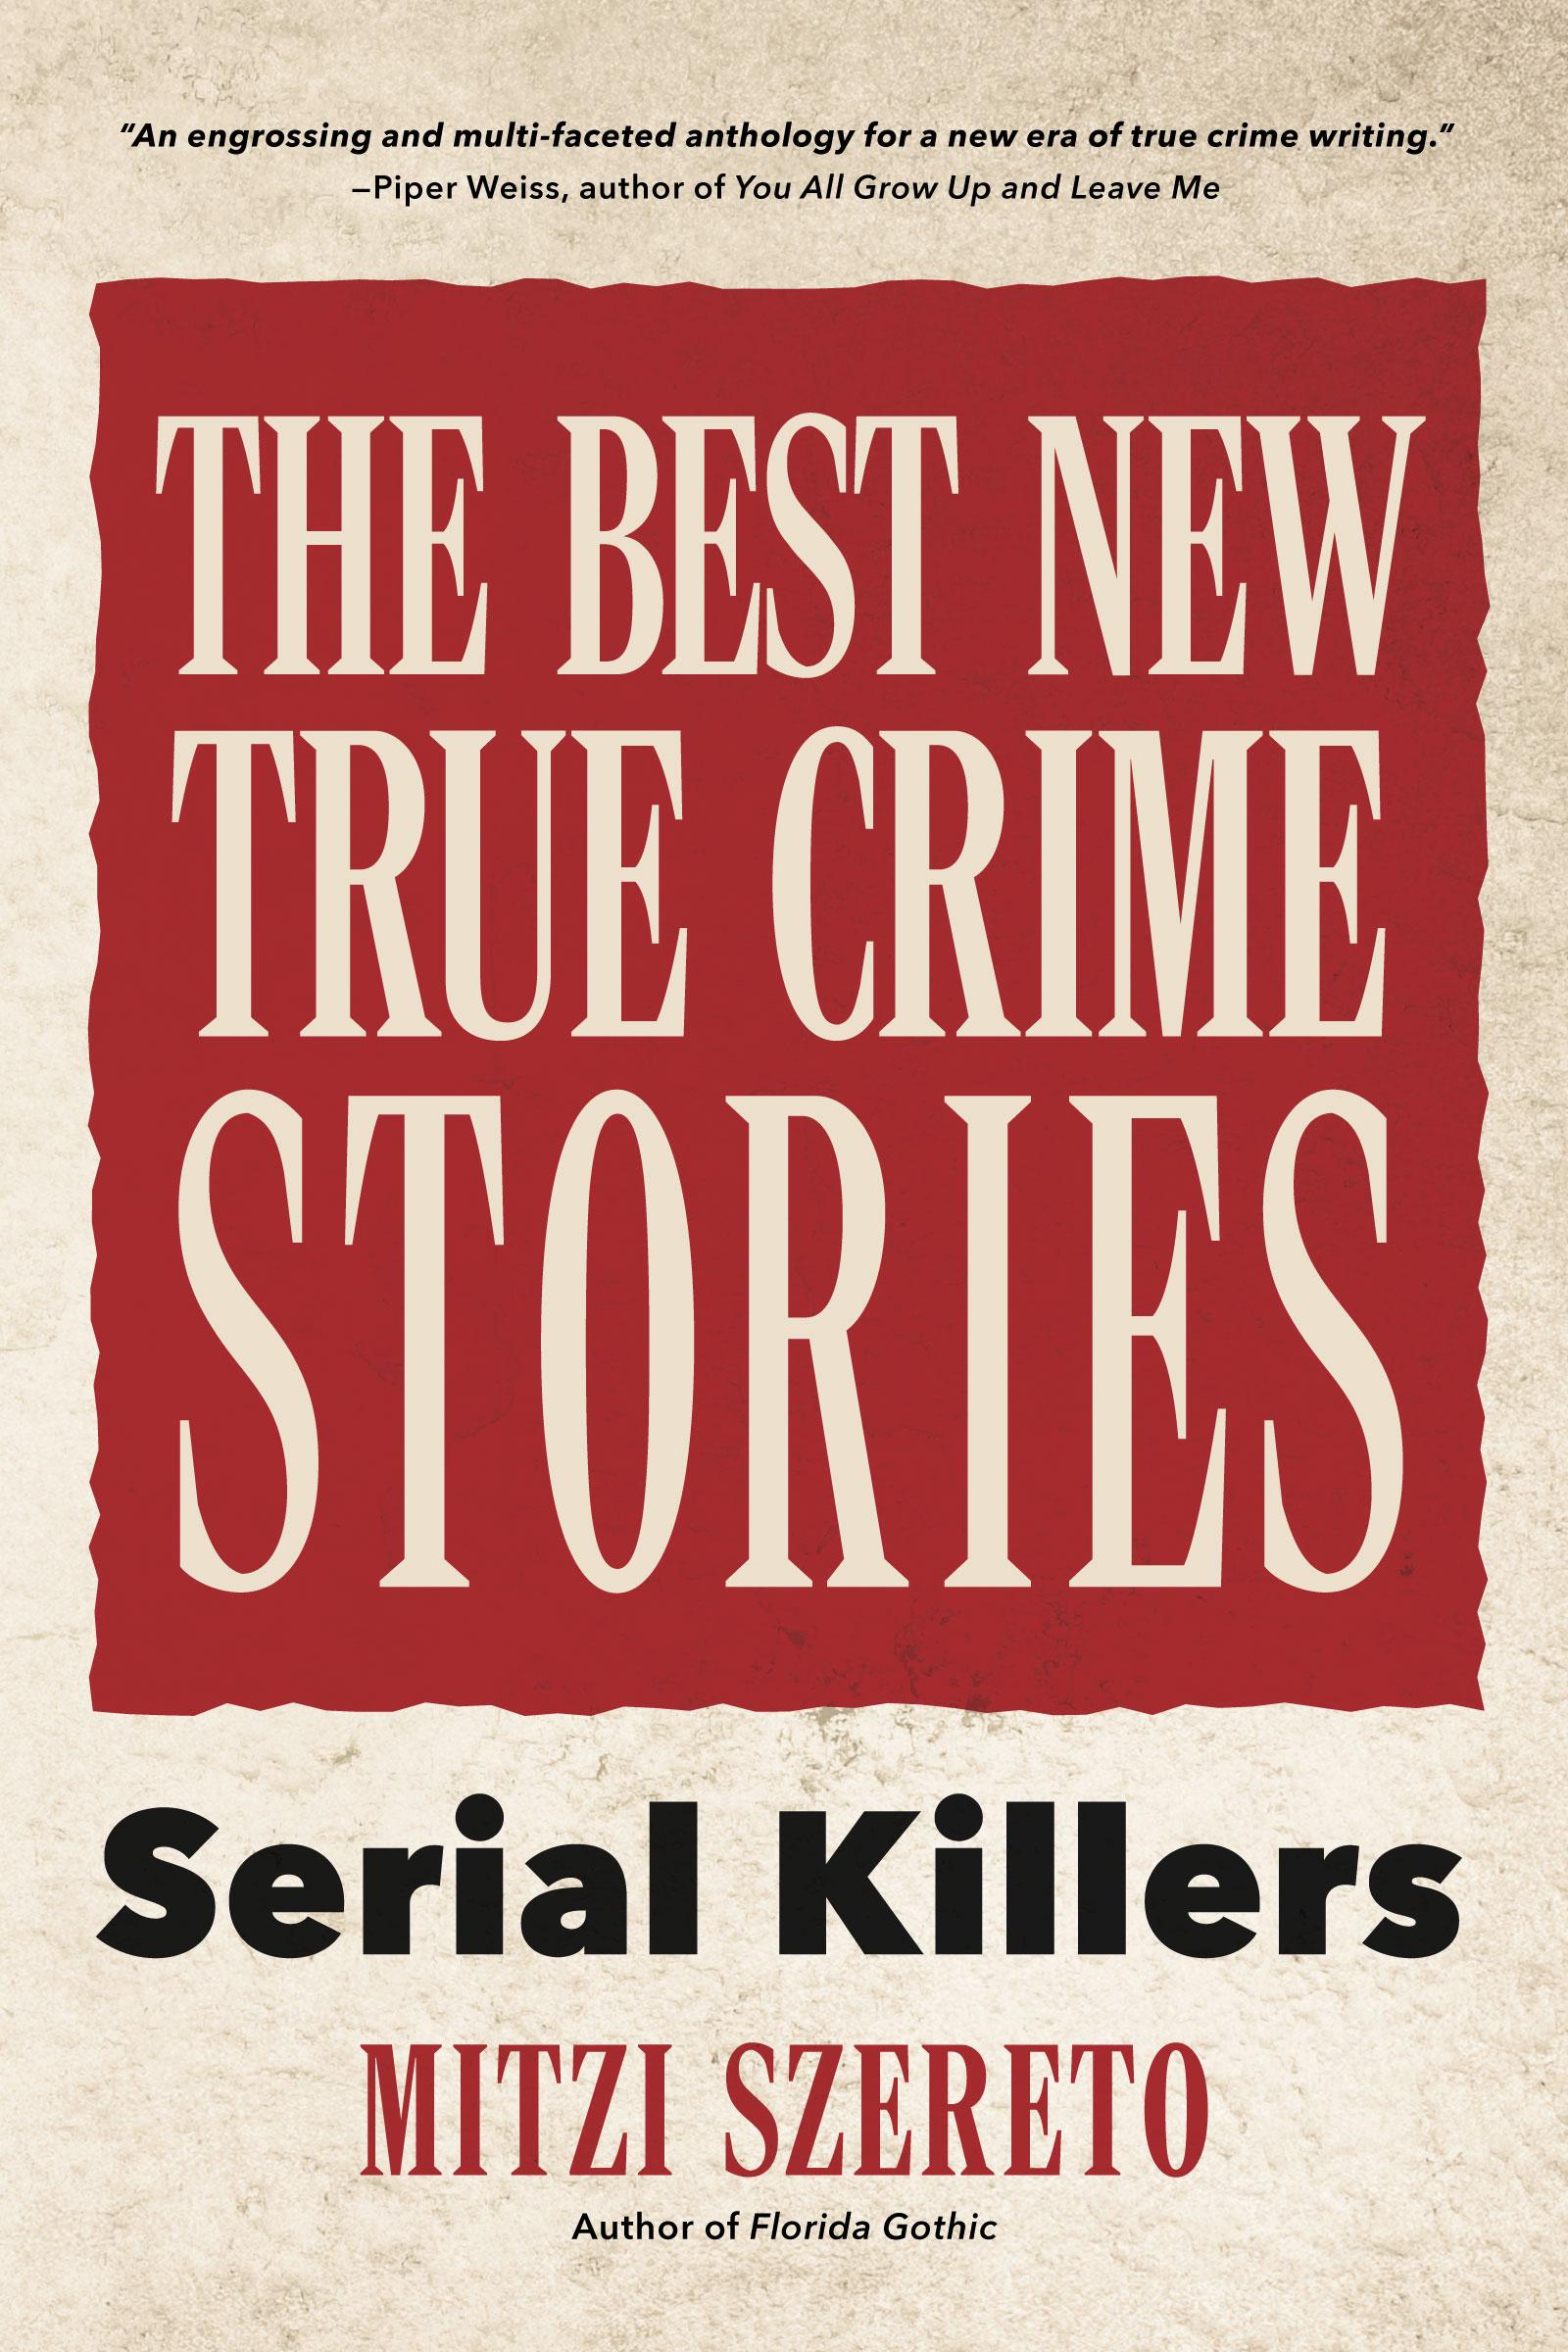 The Best New True Crime Stories: Serial Killers by Mitzi Szereto